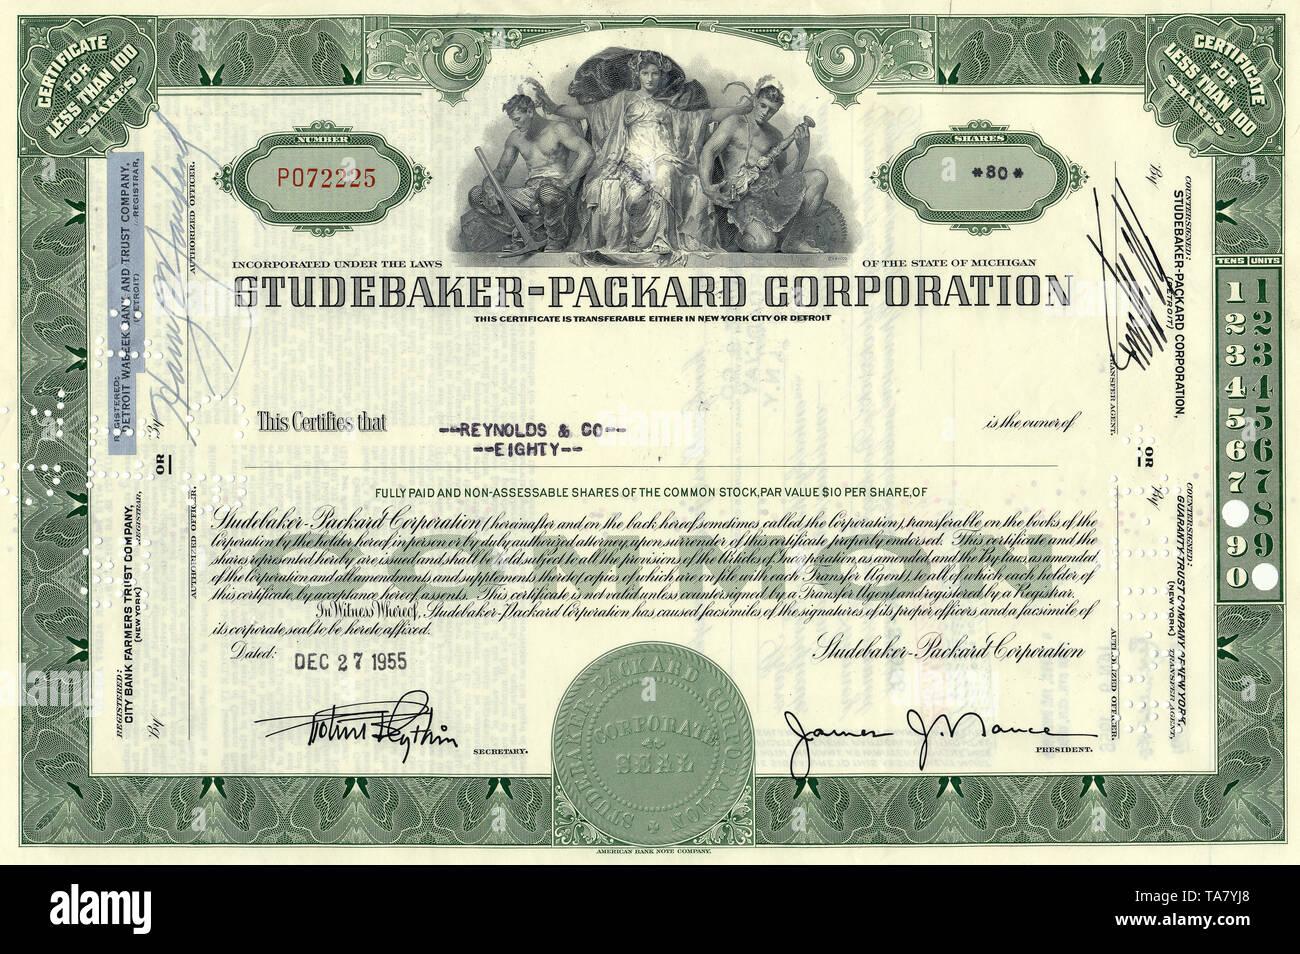 Historische Aktie, Automobilhersteller, Studebaker-Packard Corporation, 1955, New York, USA, Historical stock certificate, automobile manufacturers - Stock Image